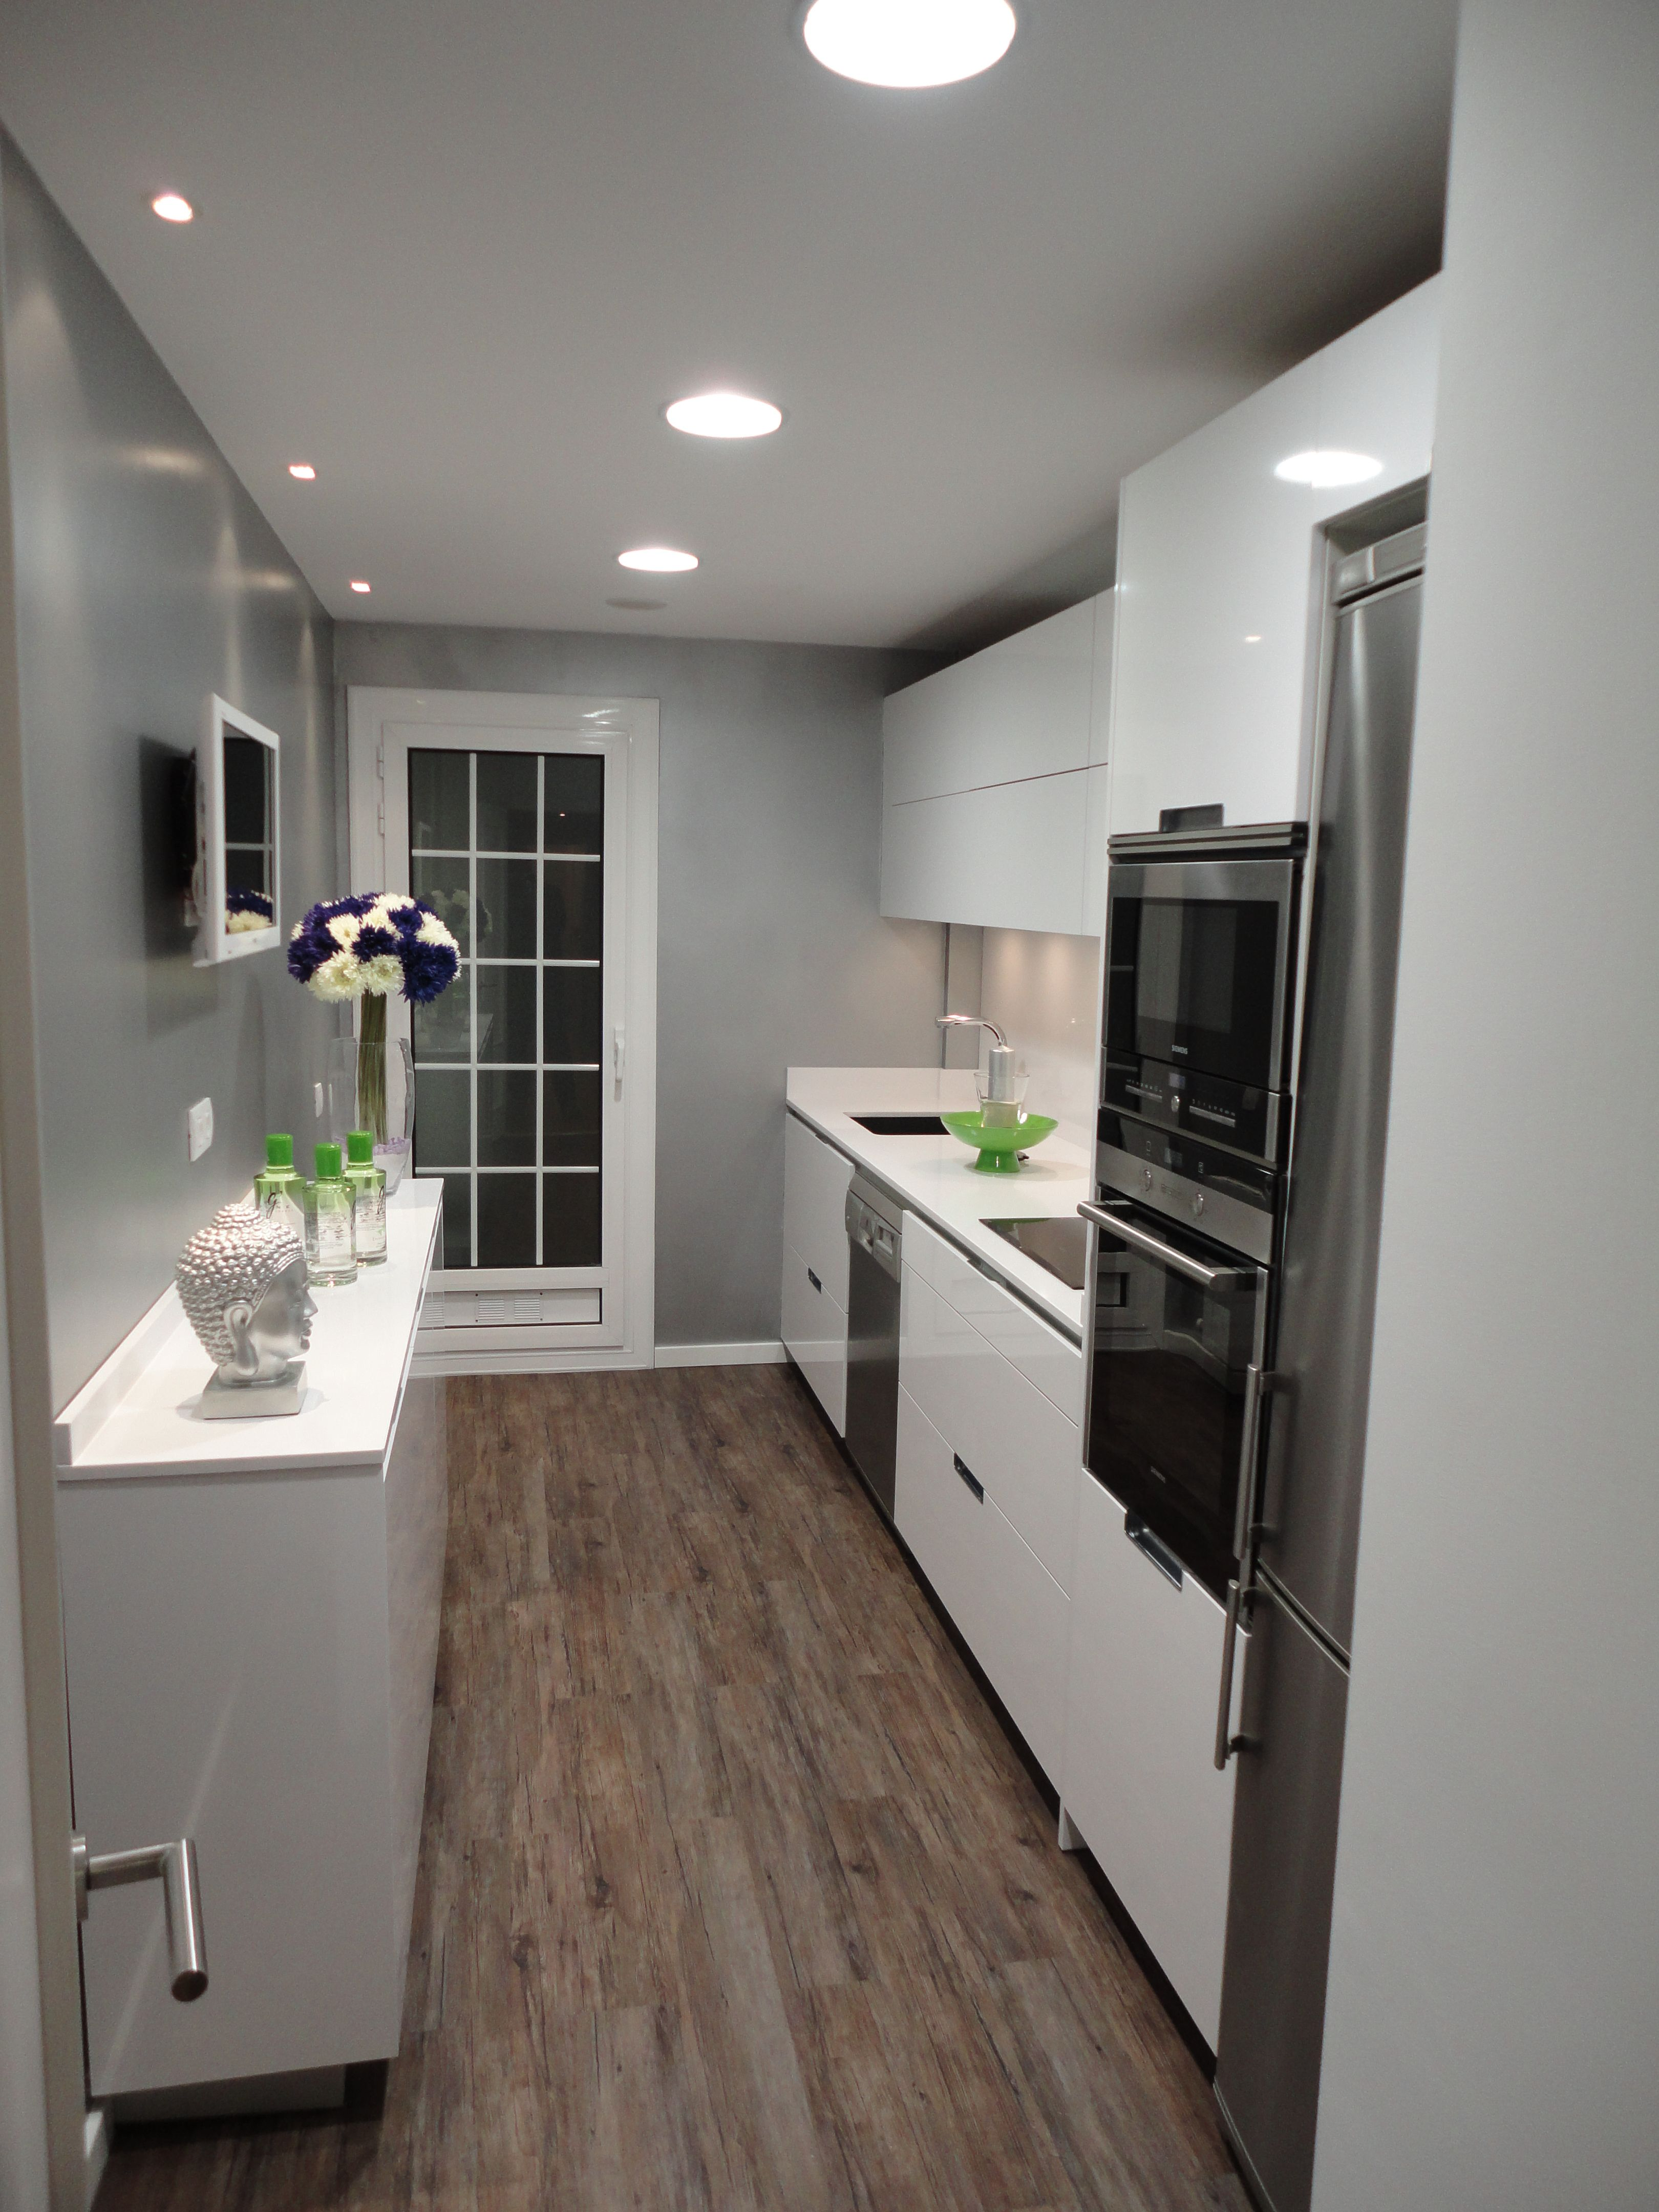 cocina santos modelo minosl blanco brillo renova interiors https